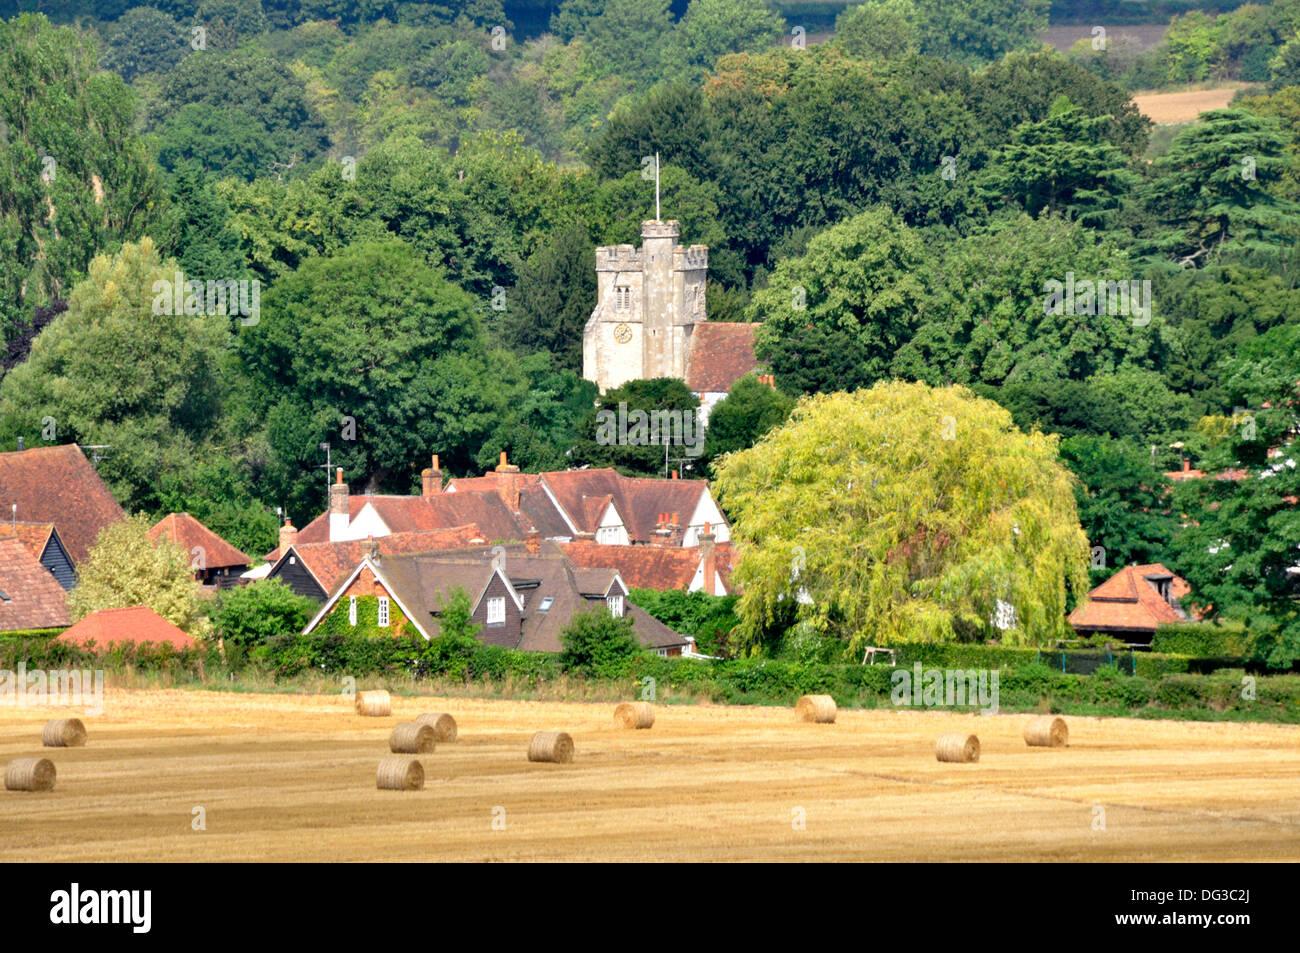 Bucks - Chiltern Hills - Little Missenden - after the harvest - bales of straw - golden stubble - village backdrop - sunlight - Stock Image